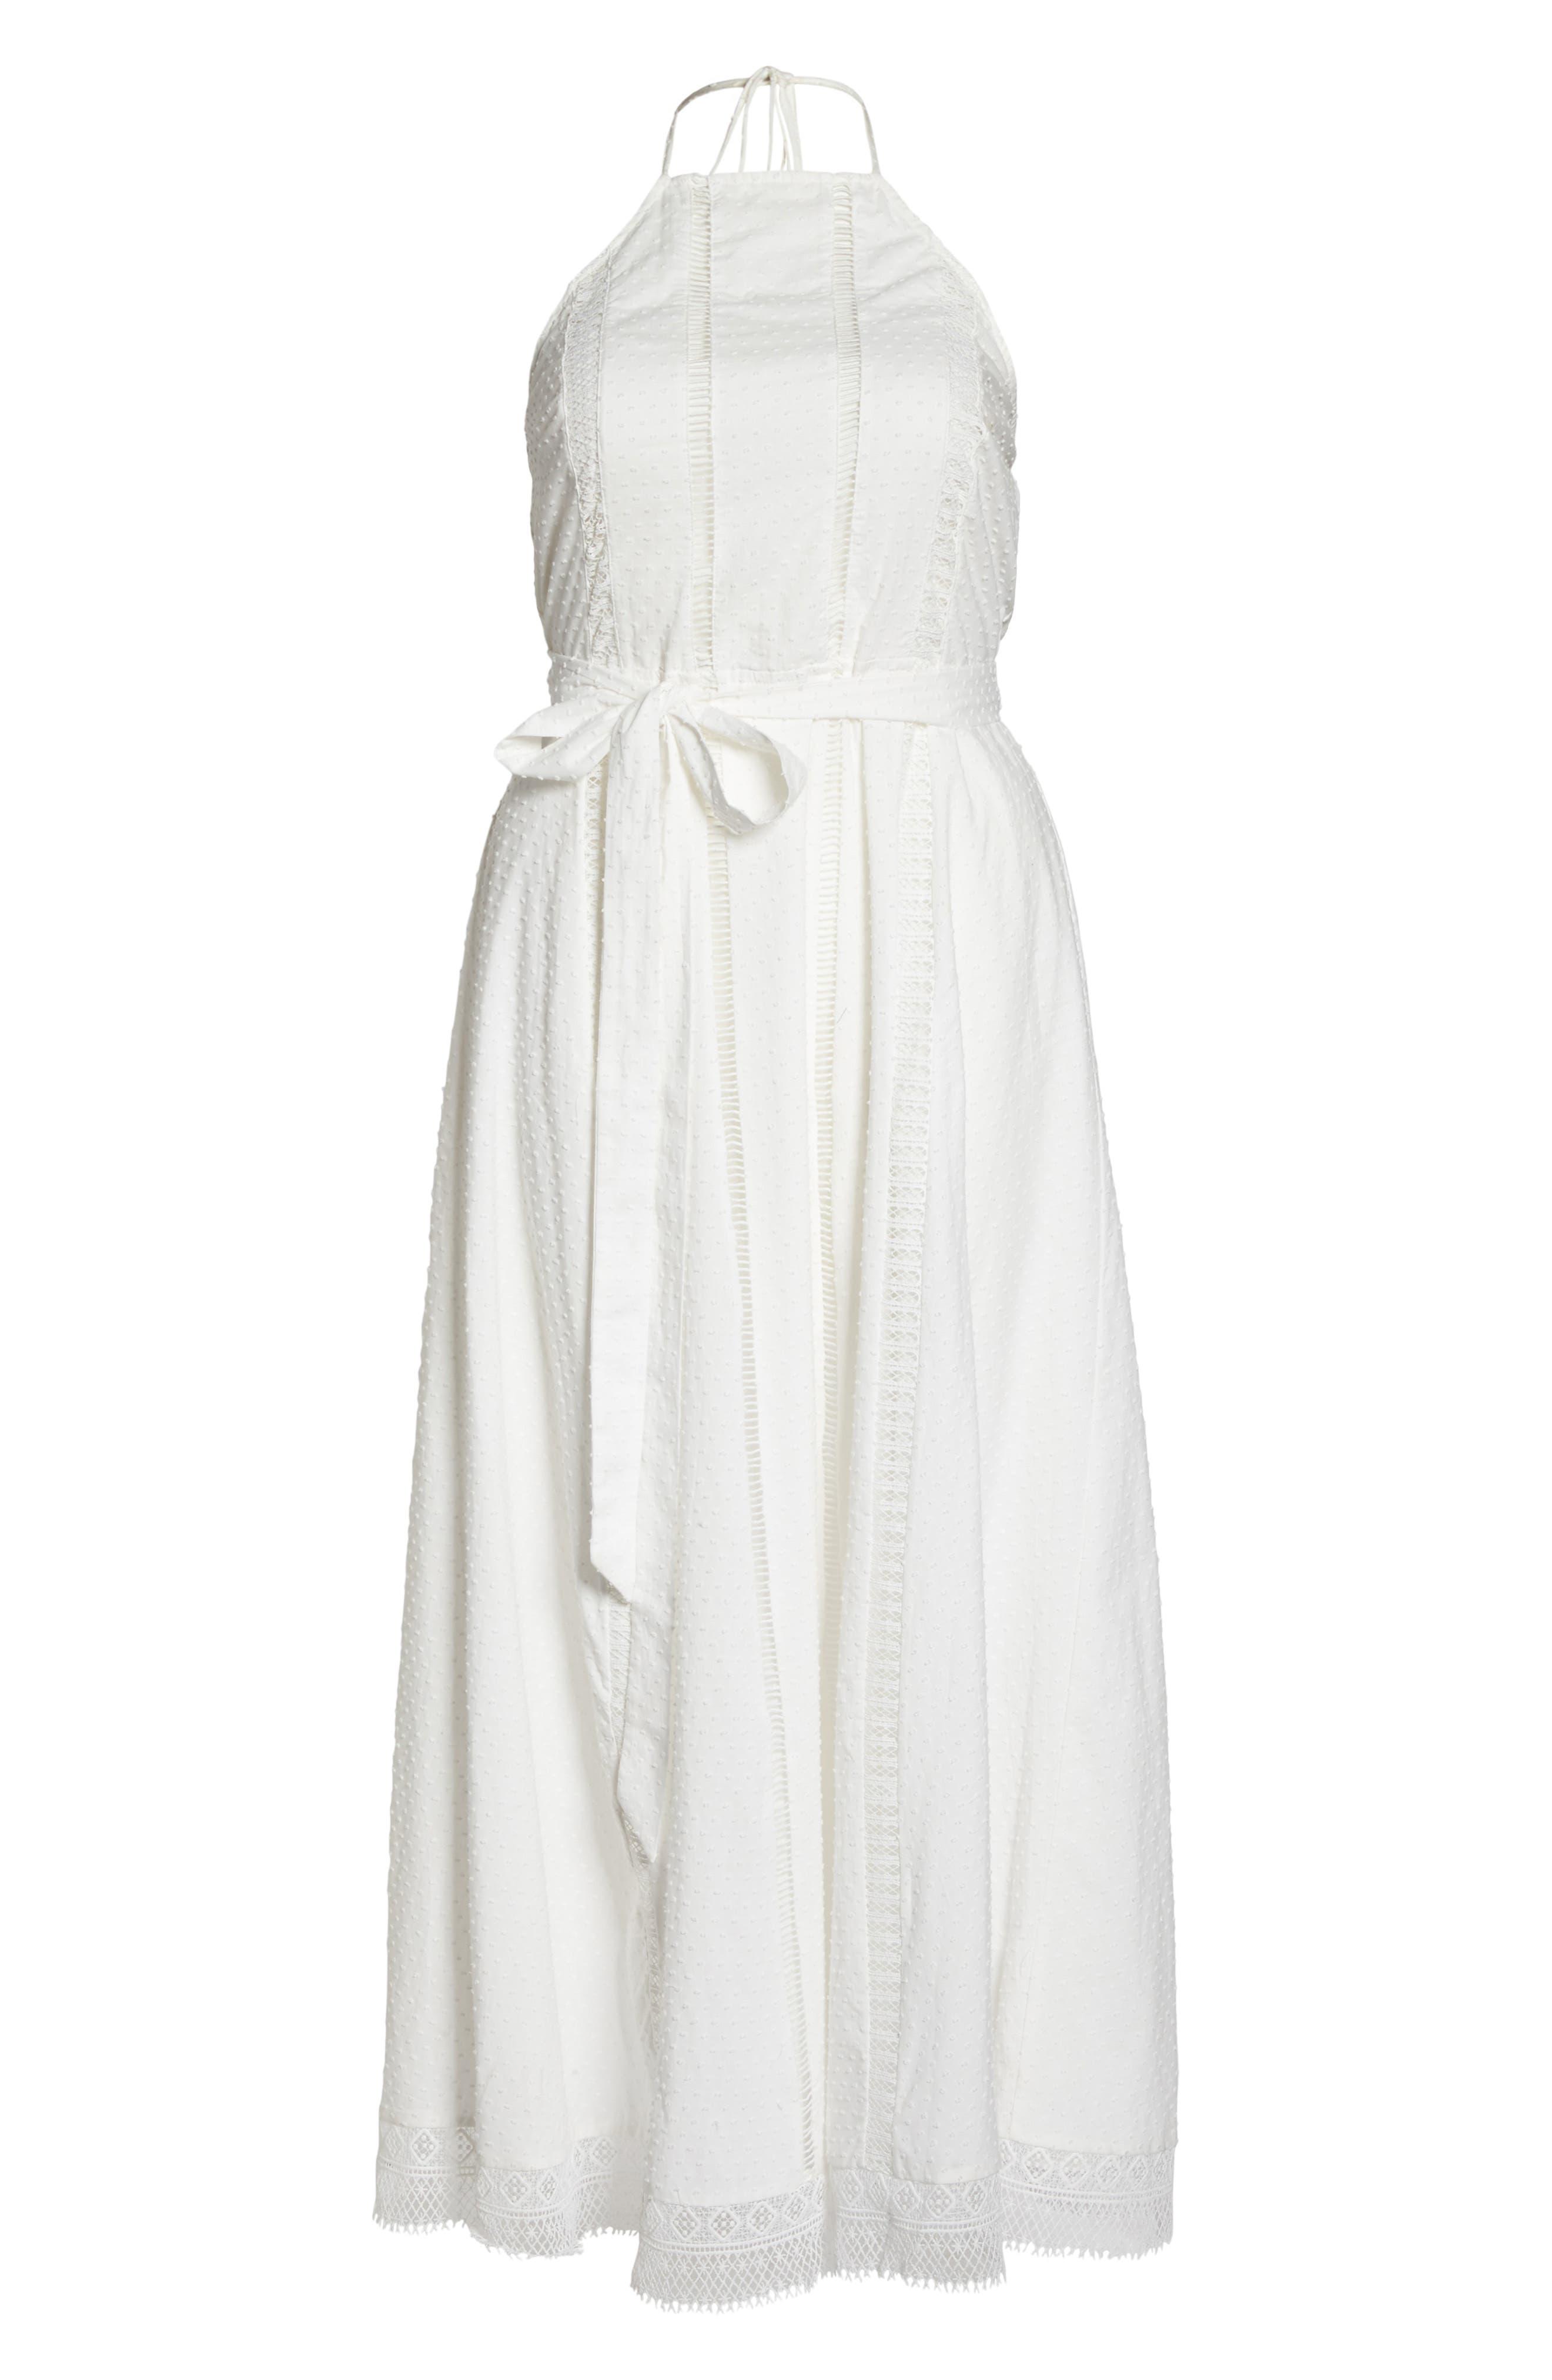 CITY CHIC, Lace Trim Swiss Dot Halter Maxi Dress, Alternate thumbnail 7, color, IVORY